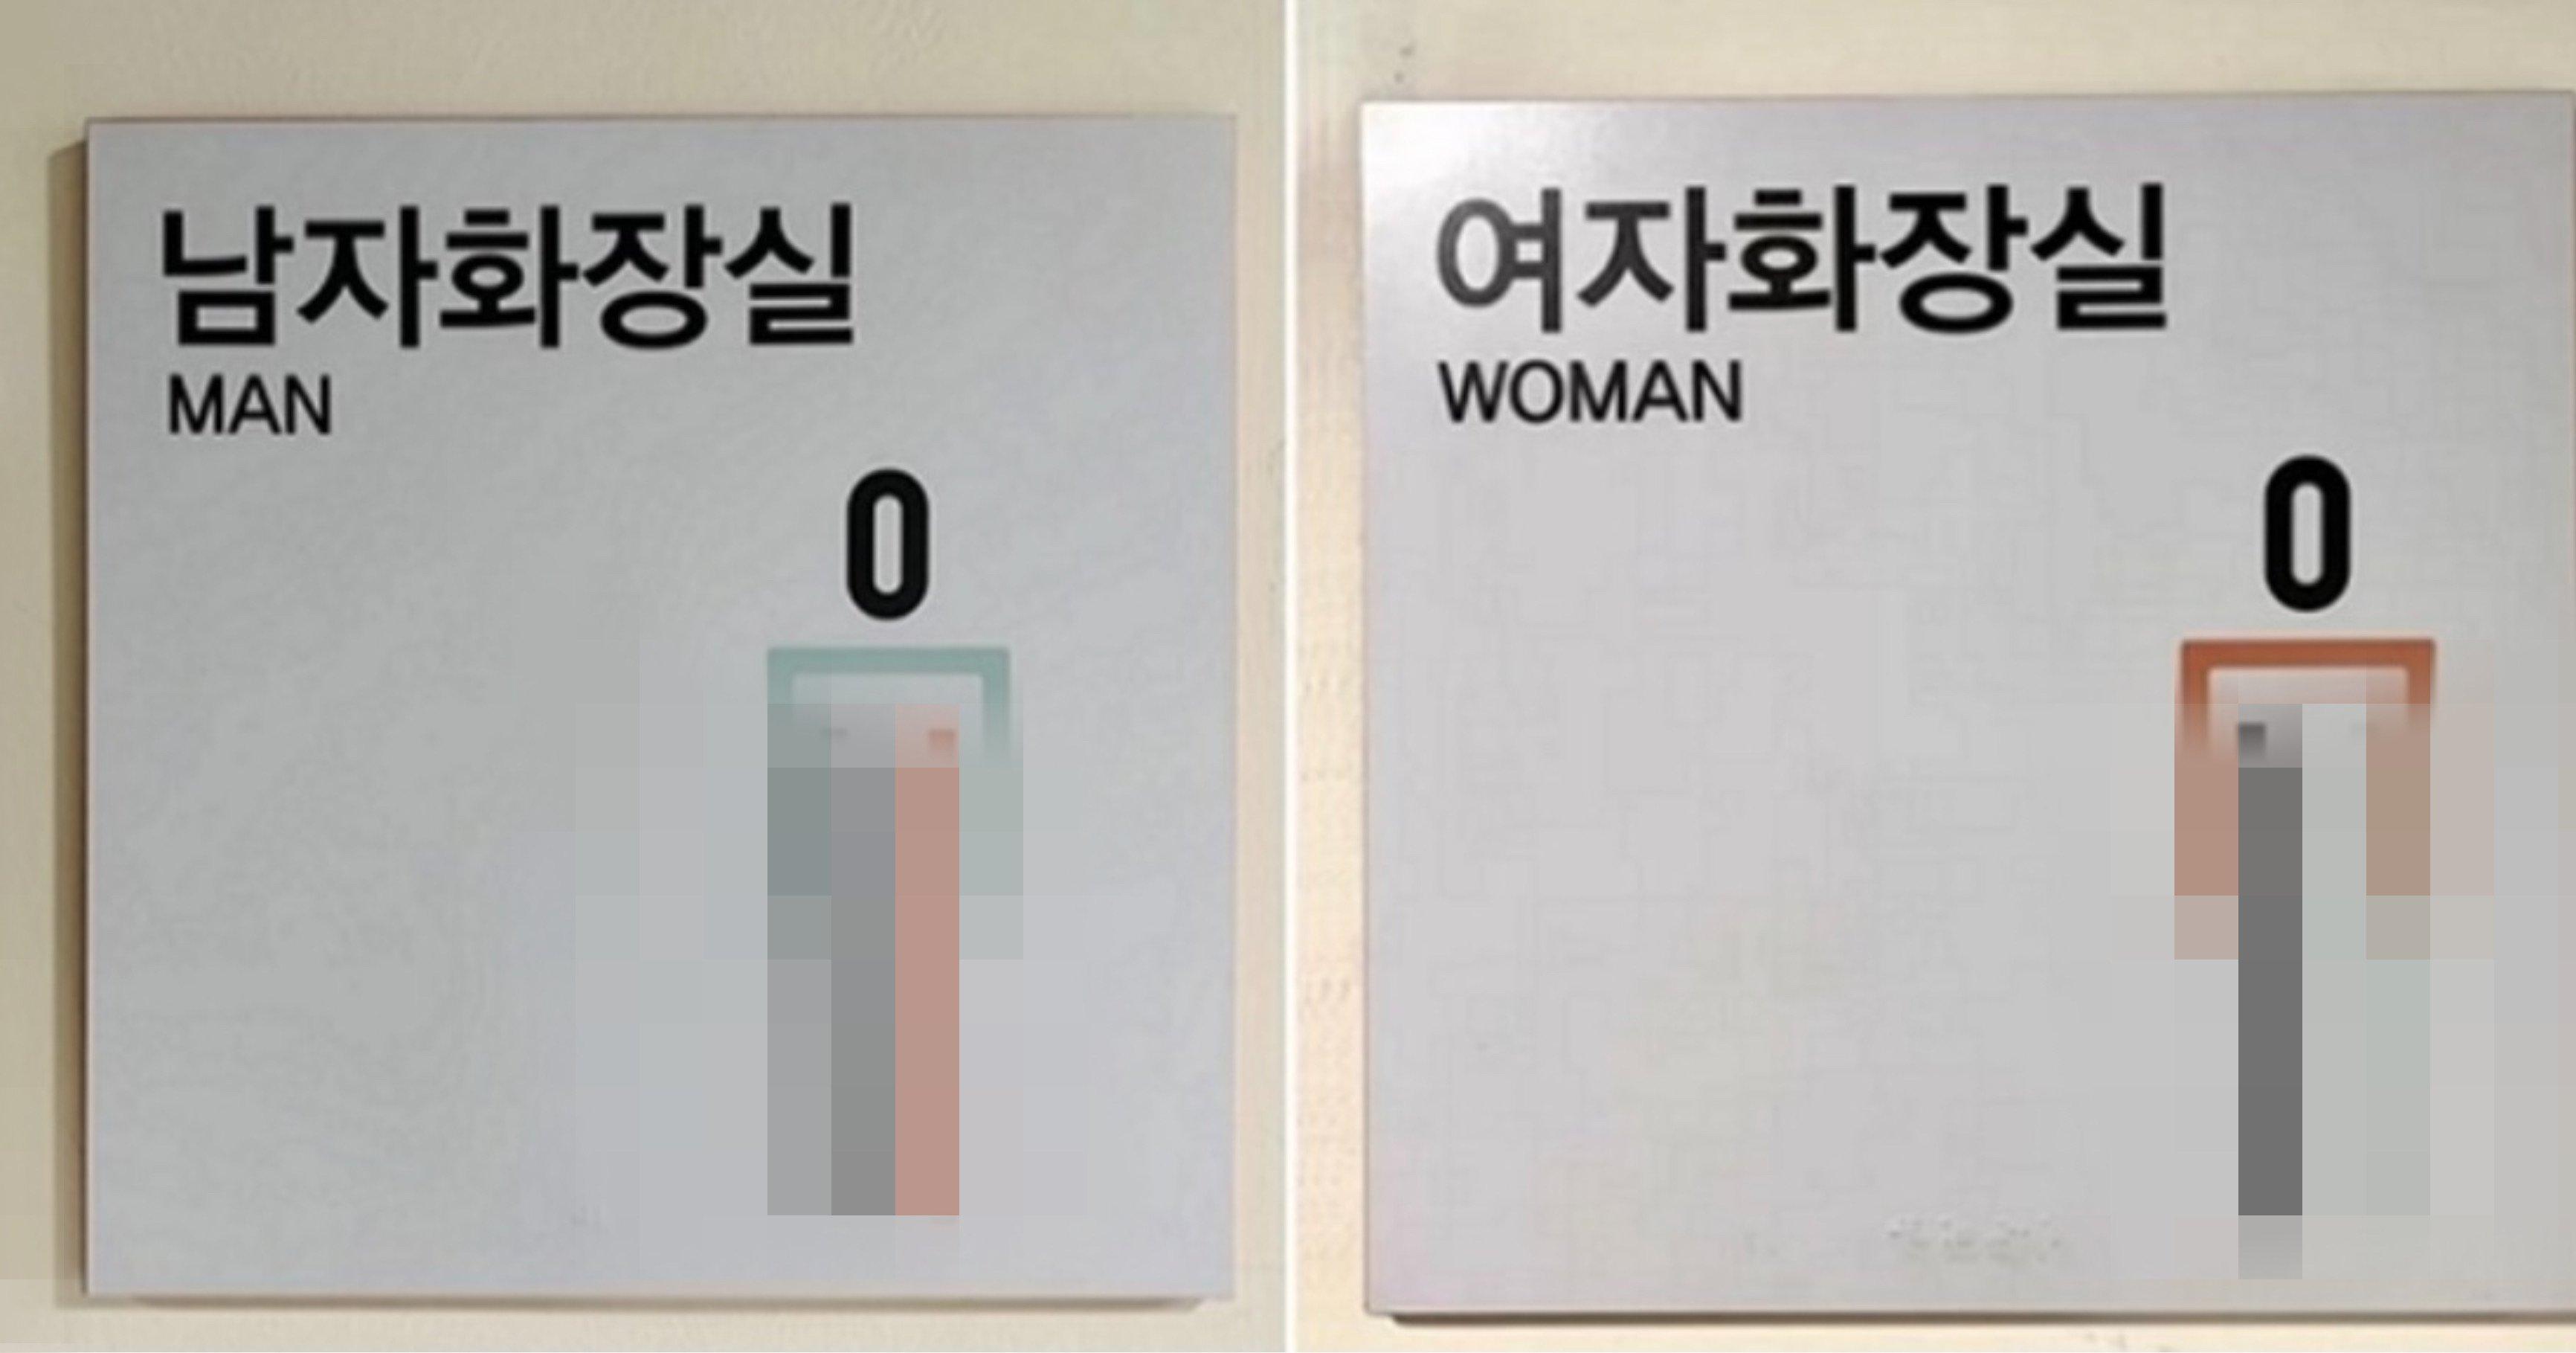 87a2b3da 6e62 40a7 921e 528377ebb4de.jpeg?resize=1200,630 - 서울시 '모두의 학교'에서 성 고정관념을 타파하기 위해 실제 사용하고 있는 남녀 화장실 '팻말'